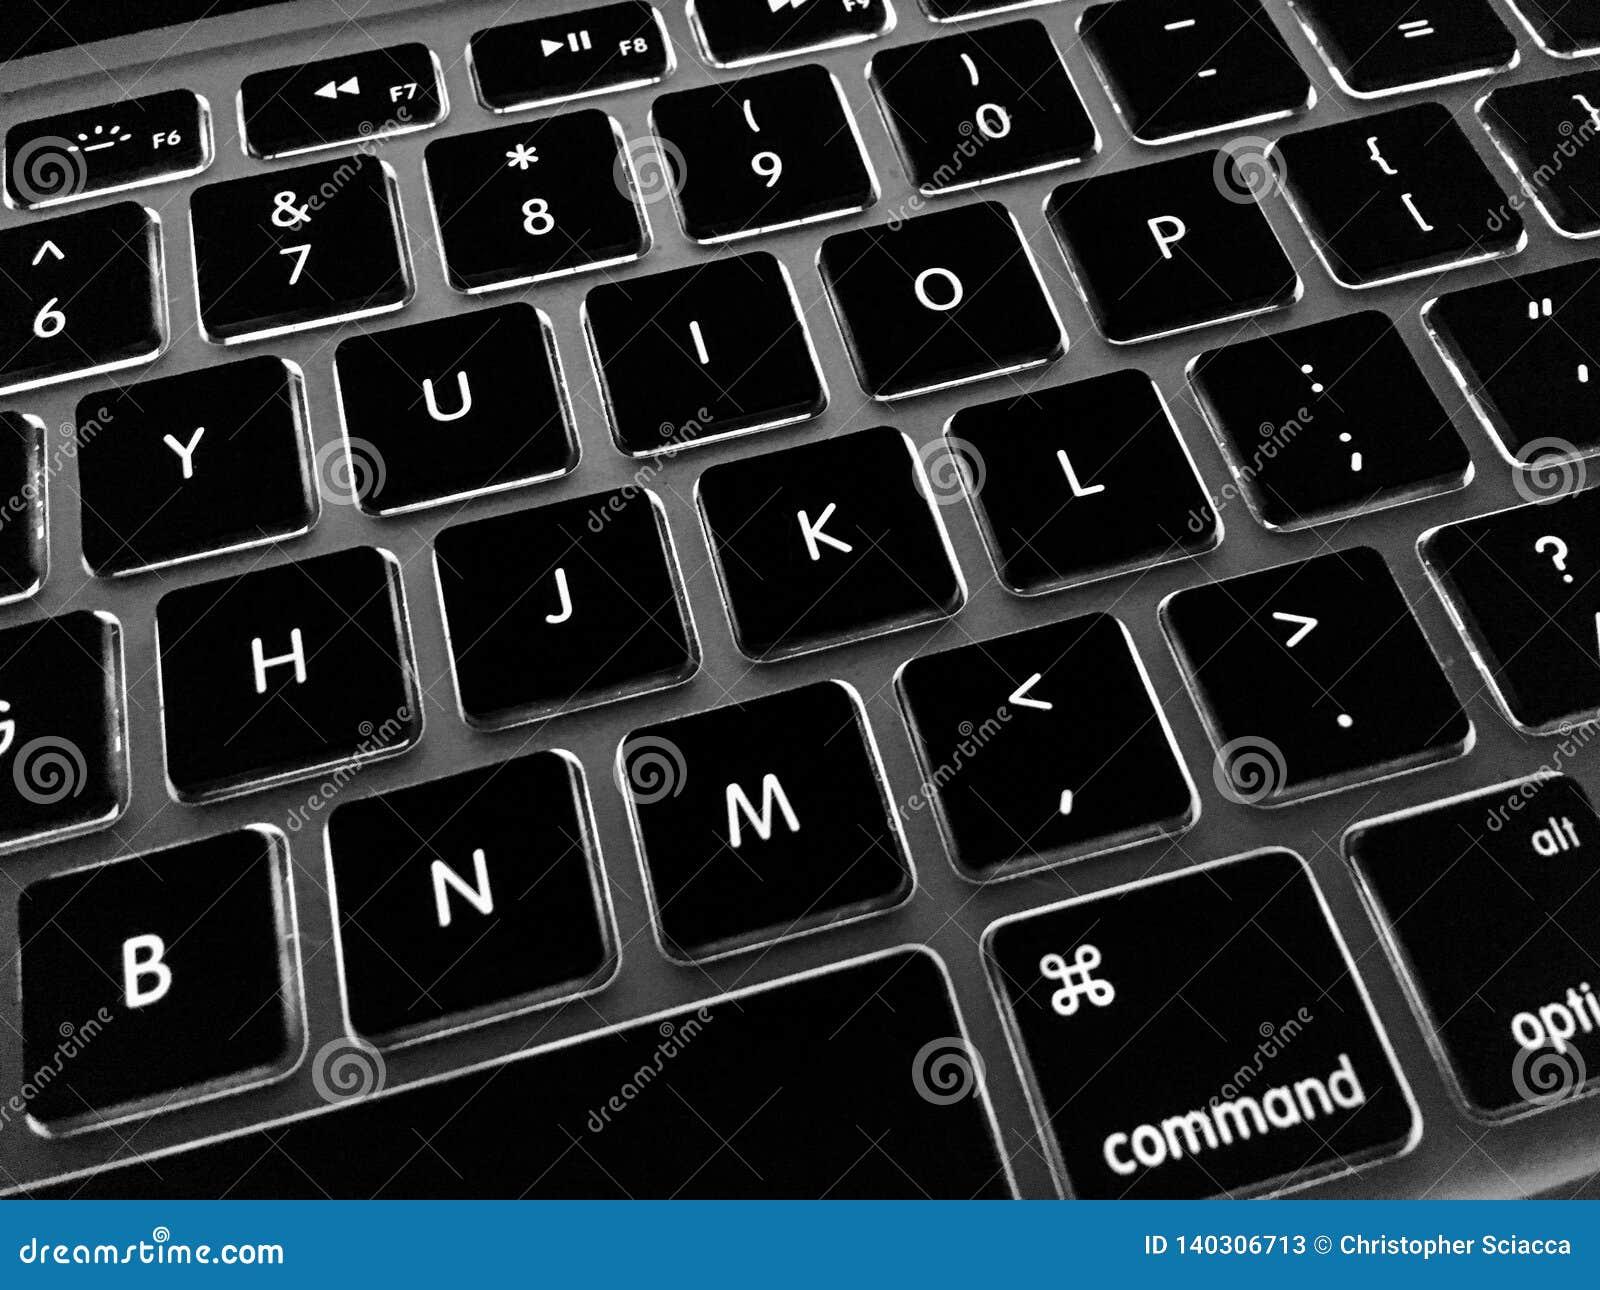 Teclado do portátil que utitlixing chaves retroiluminadas